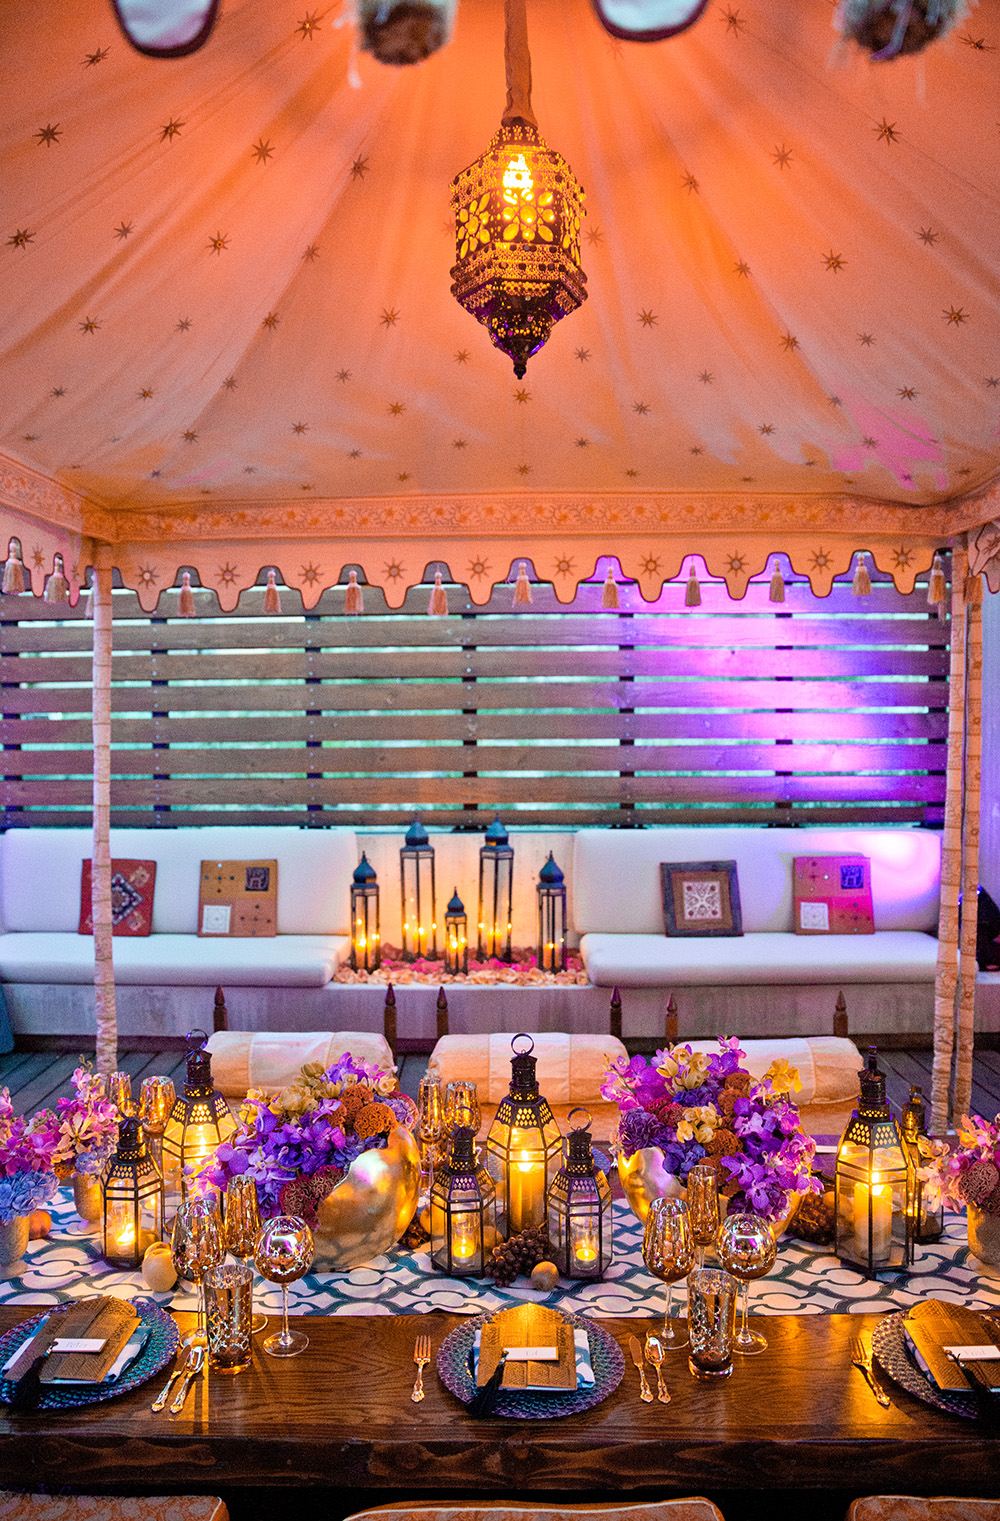 Moroccan theme table setting